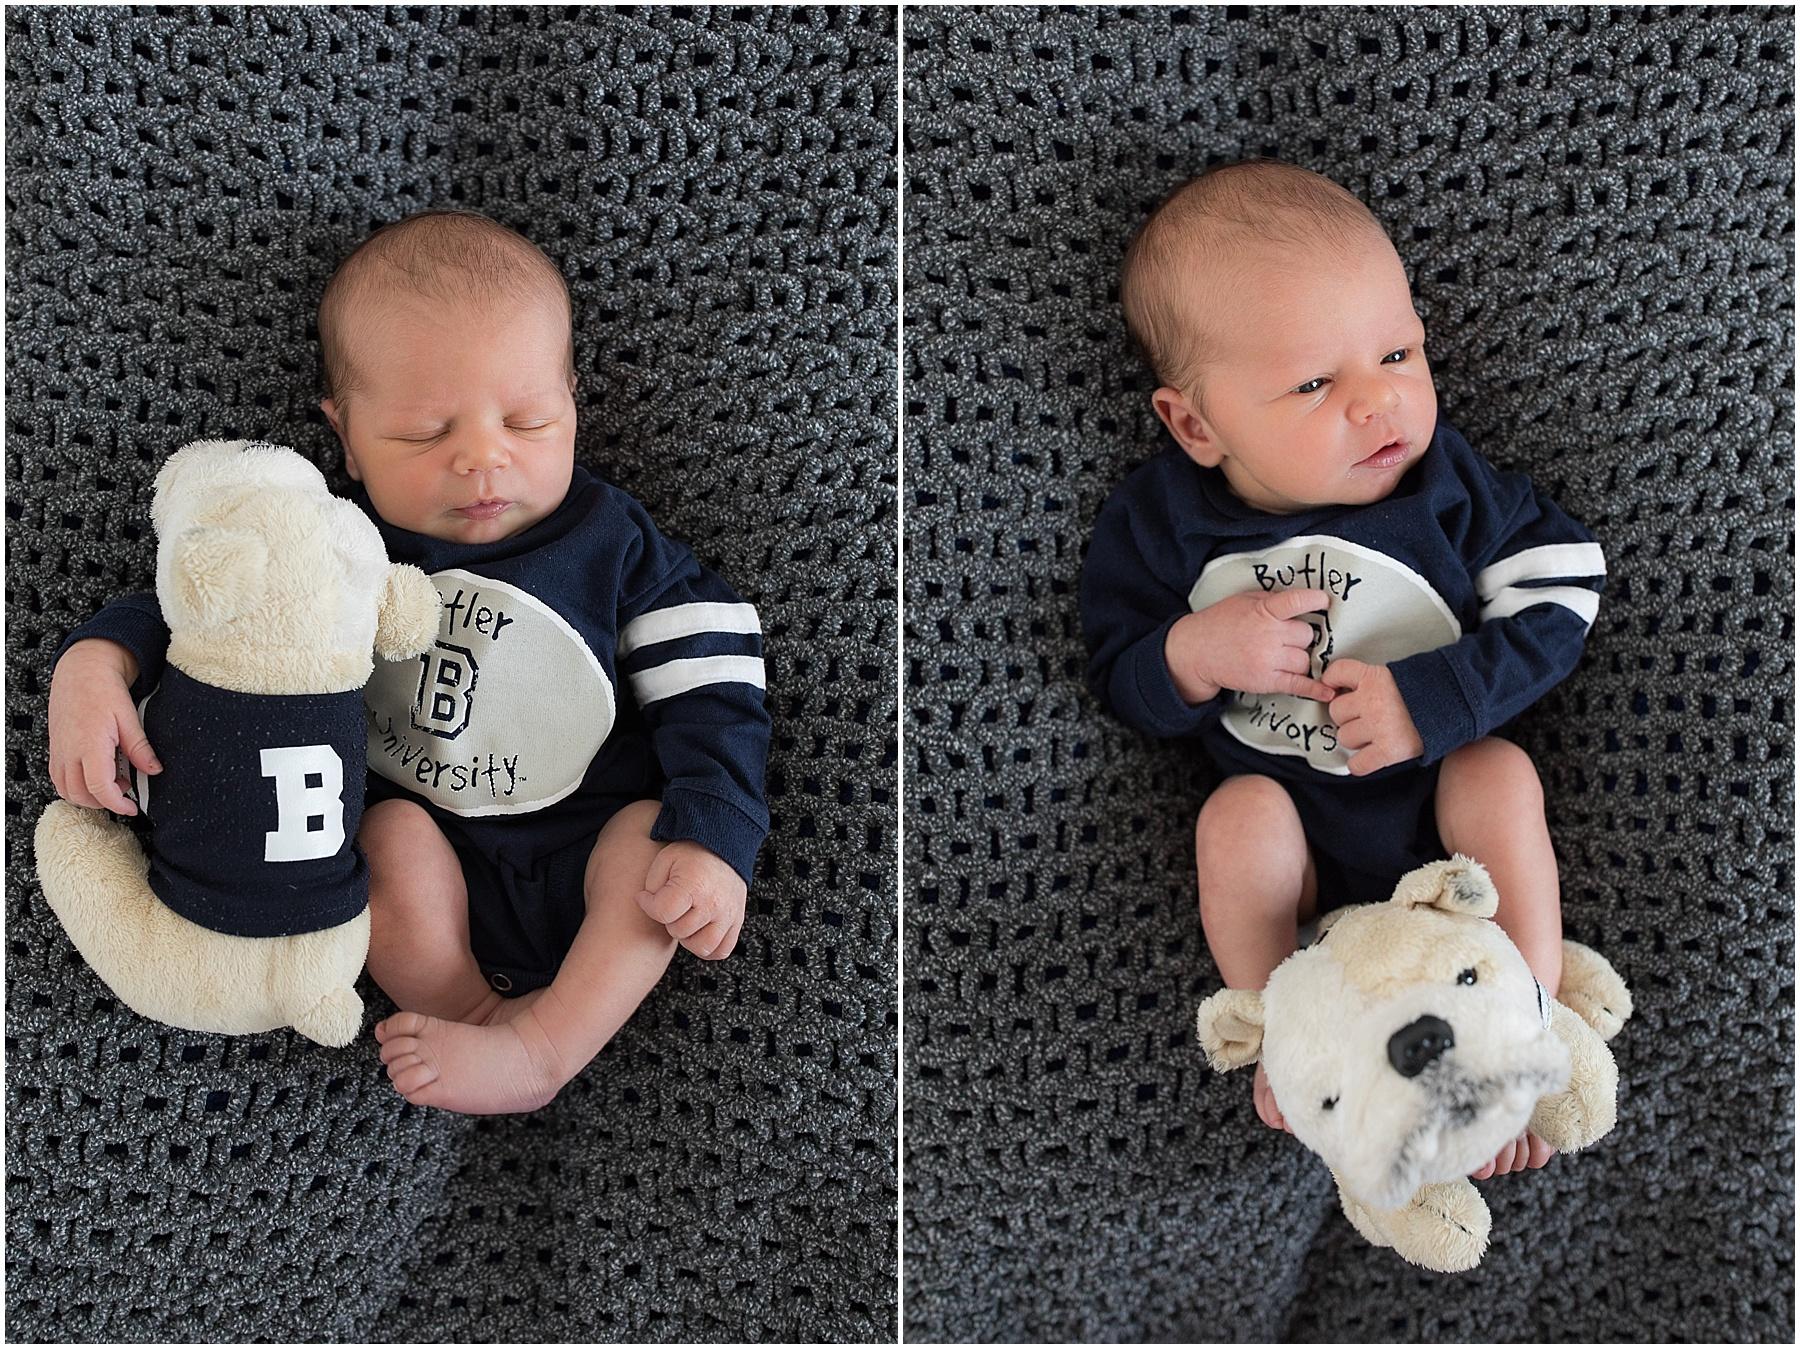 Newborn baby boy and his Butler stuffed animal, Indianapolis Newborn Photography, Raindancer Studios